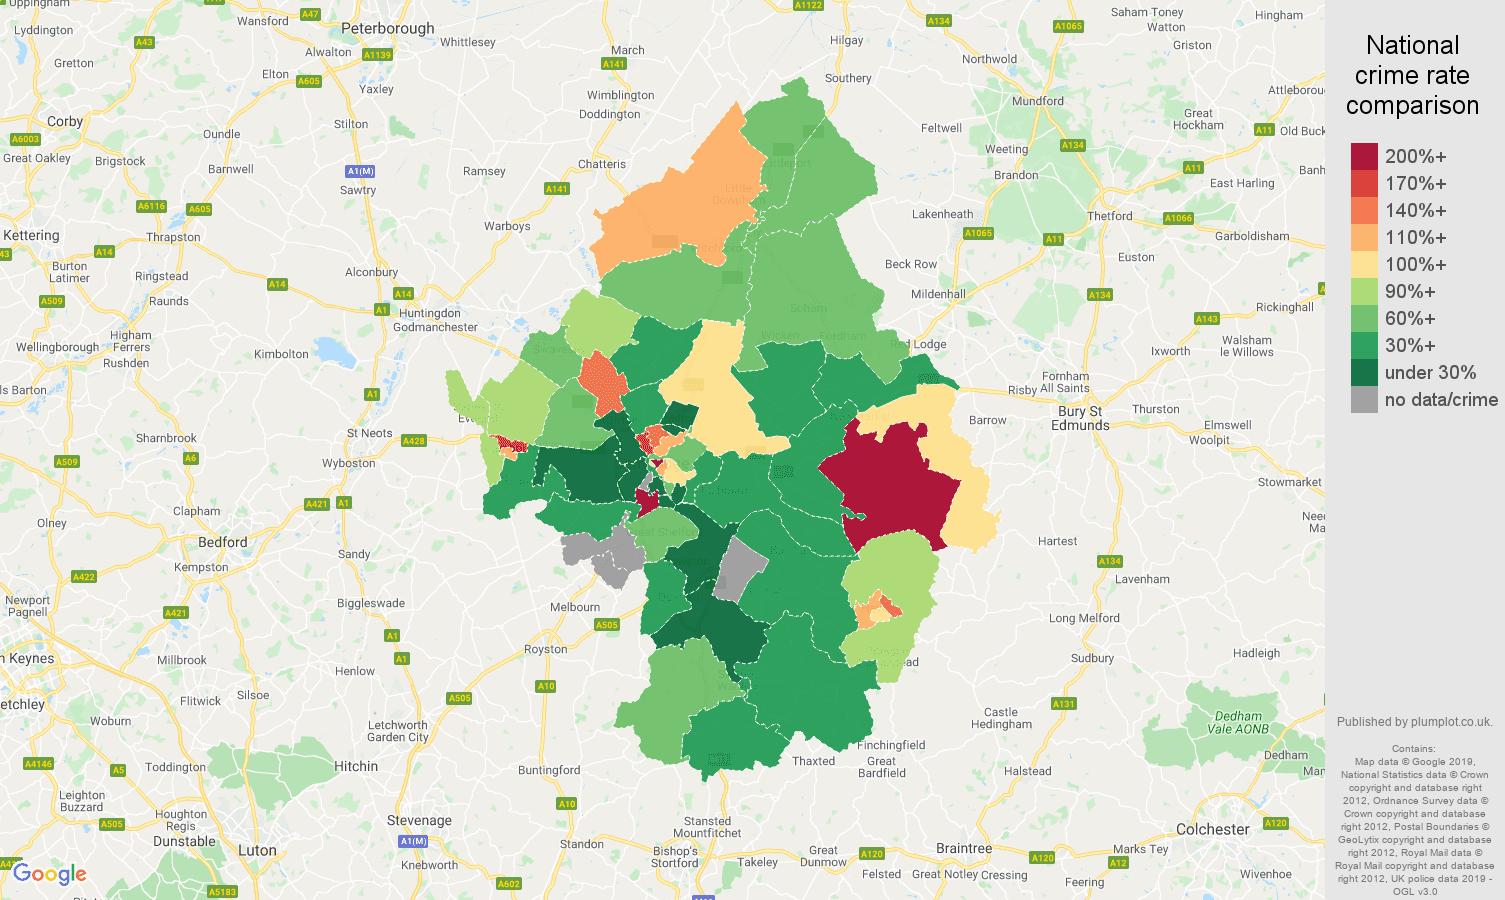 Cambridge other crime rate comparison map